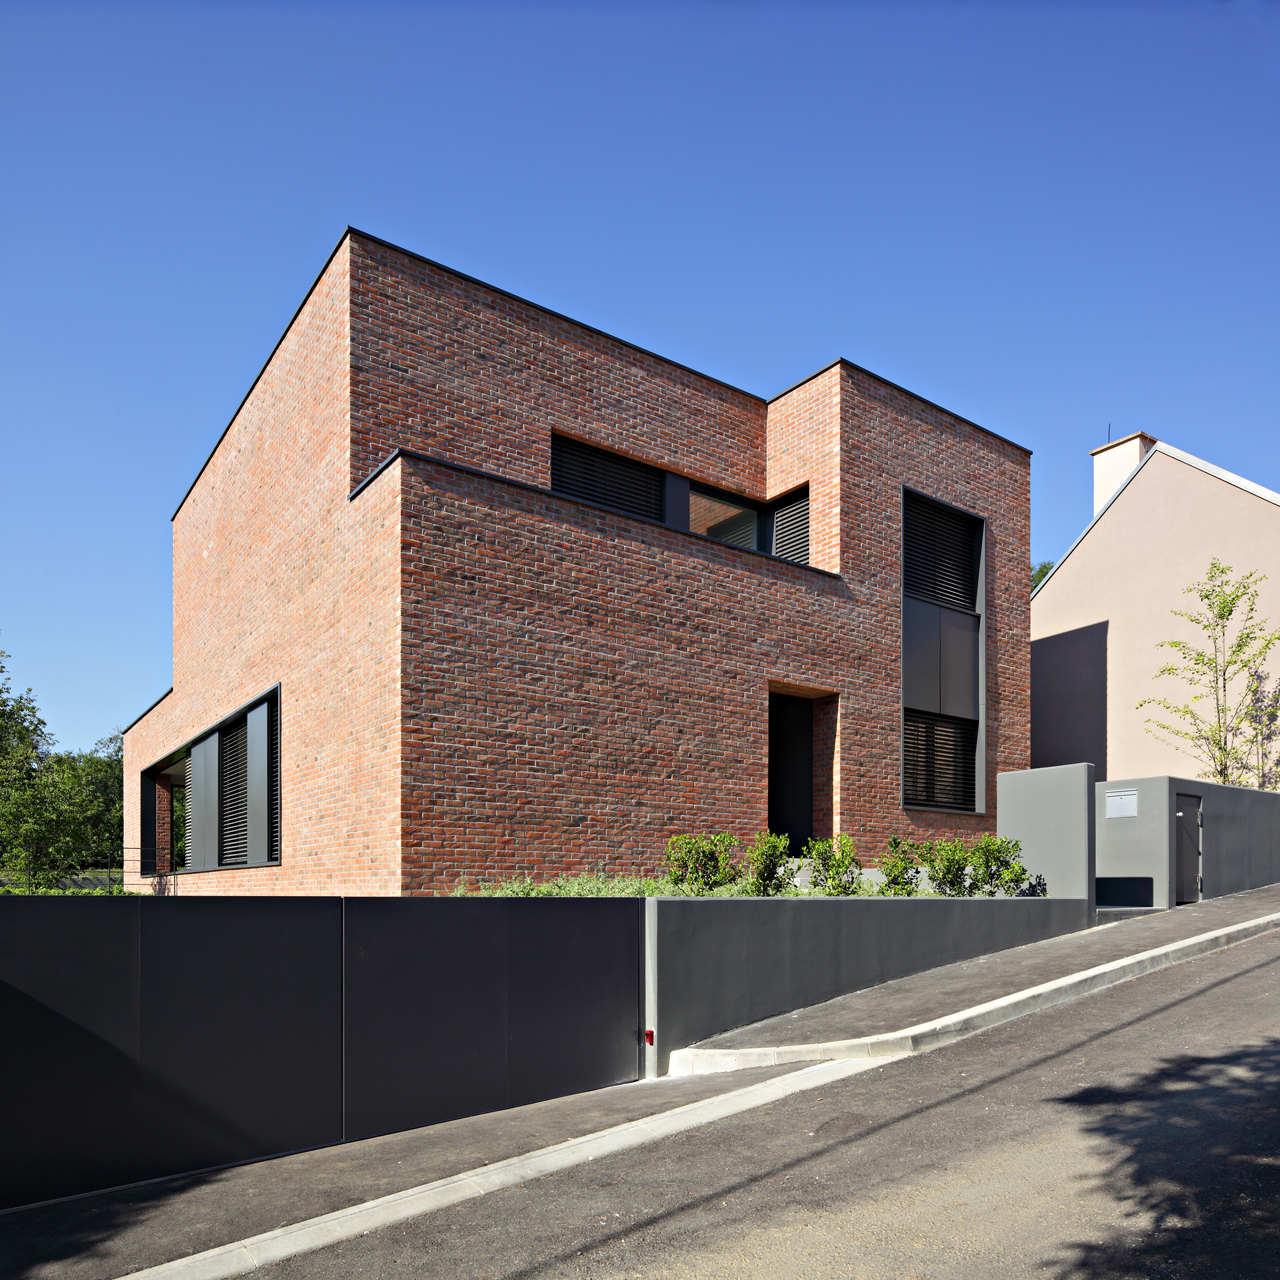 Podfuscak Residence / Dva Arhitekta, © Robert Leš